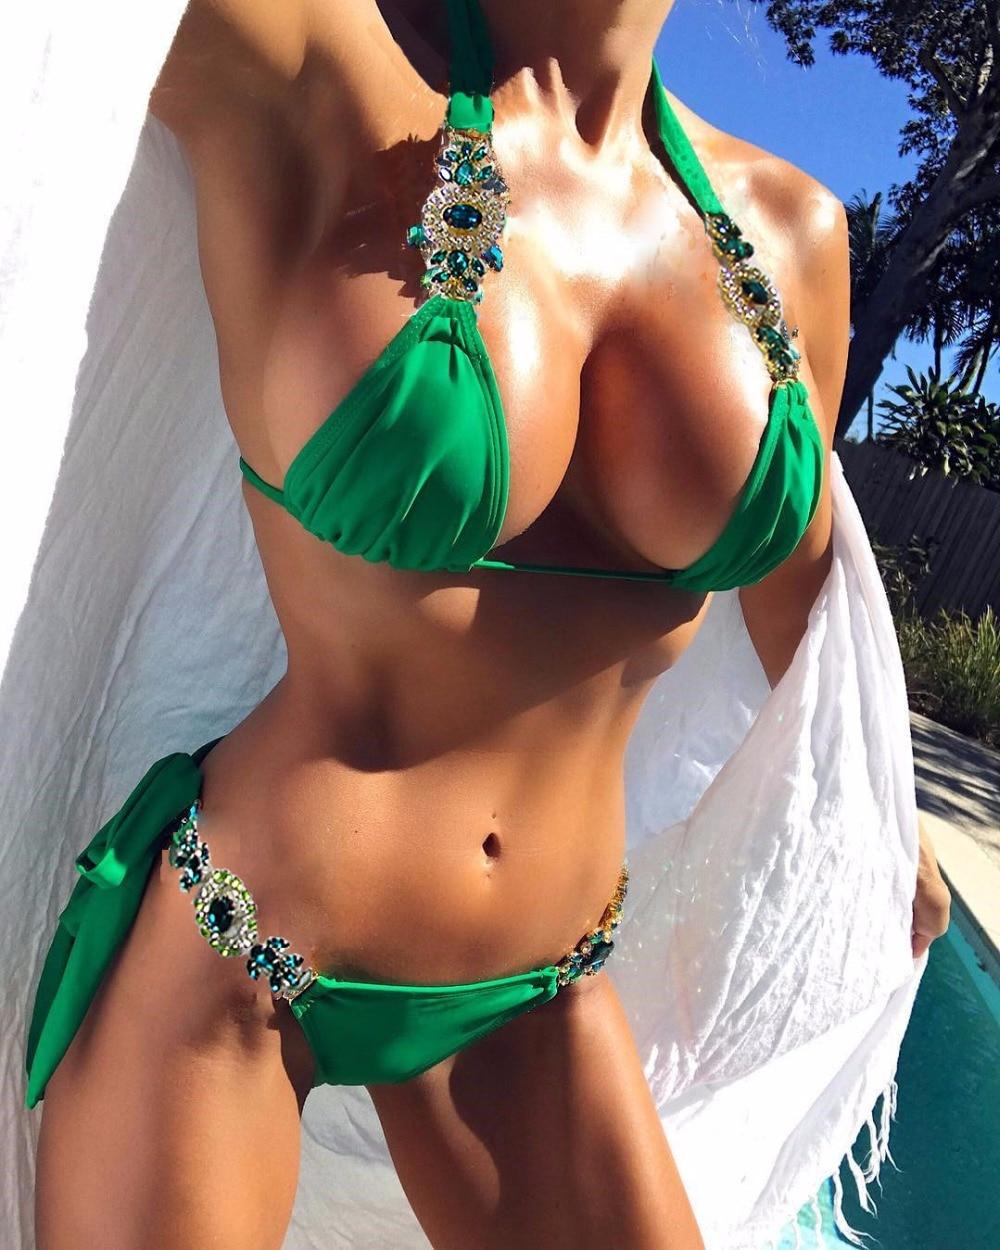 Bandage Bikini Crystal Swimsuit Monokini Swimwear Women Green Bikinis Brazilian Rhinestone Beachwear PushUp Bikini 2018 Biquini